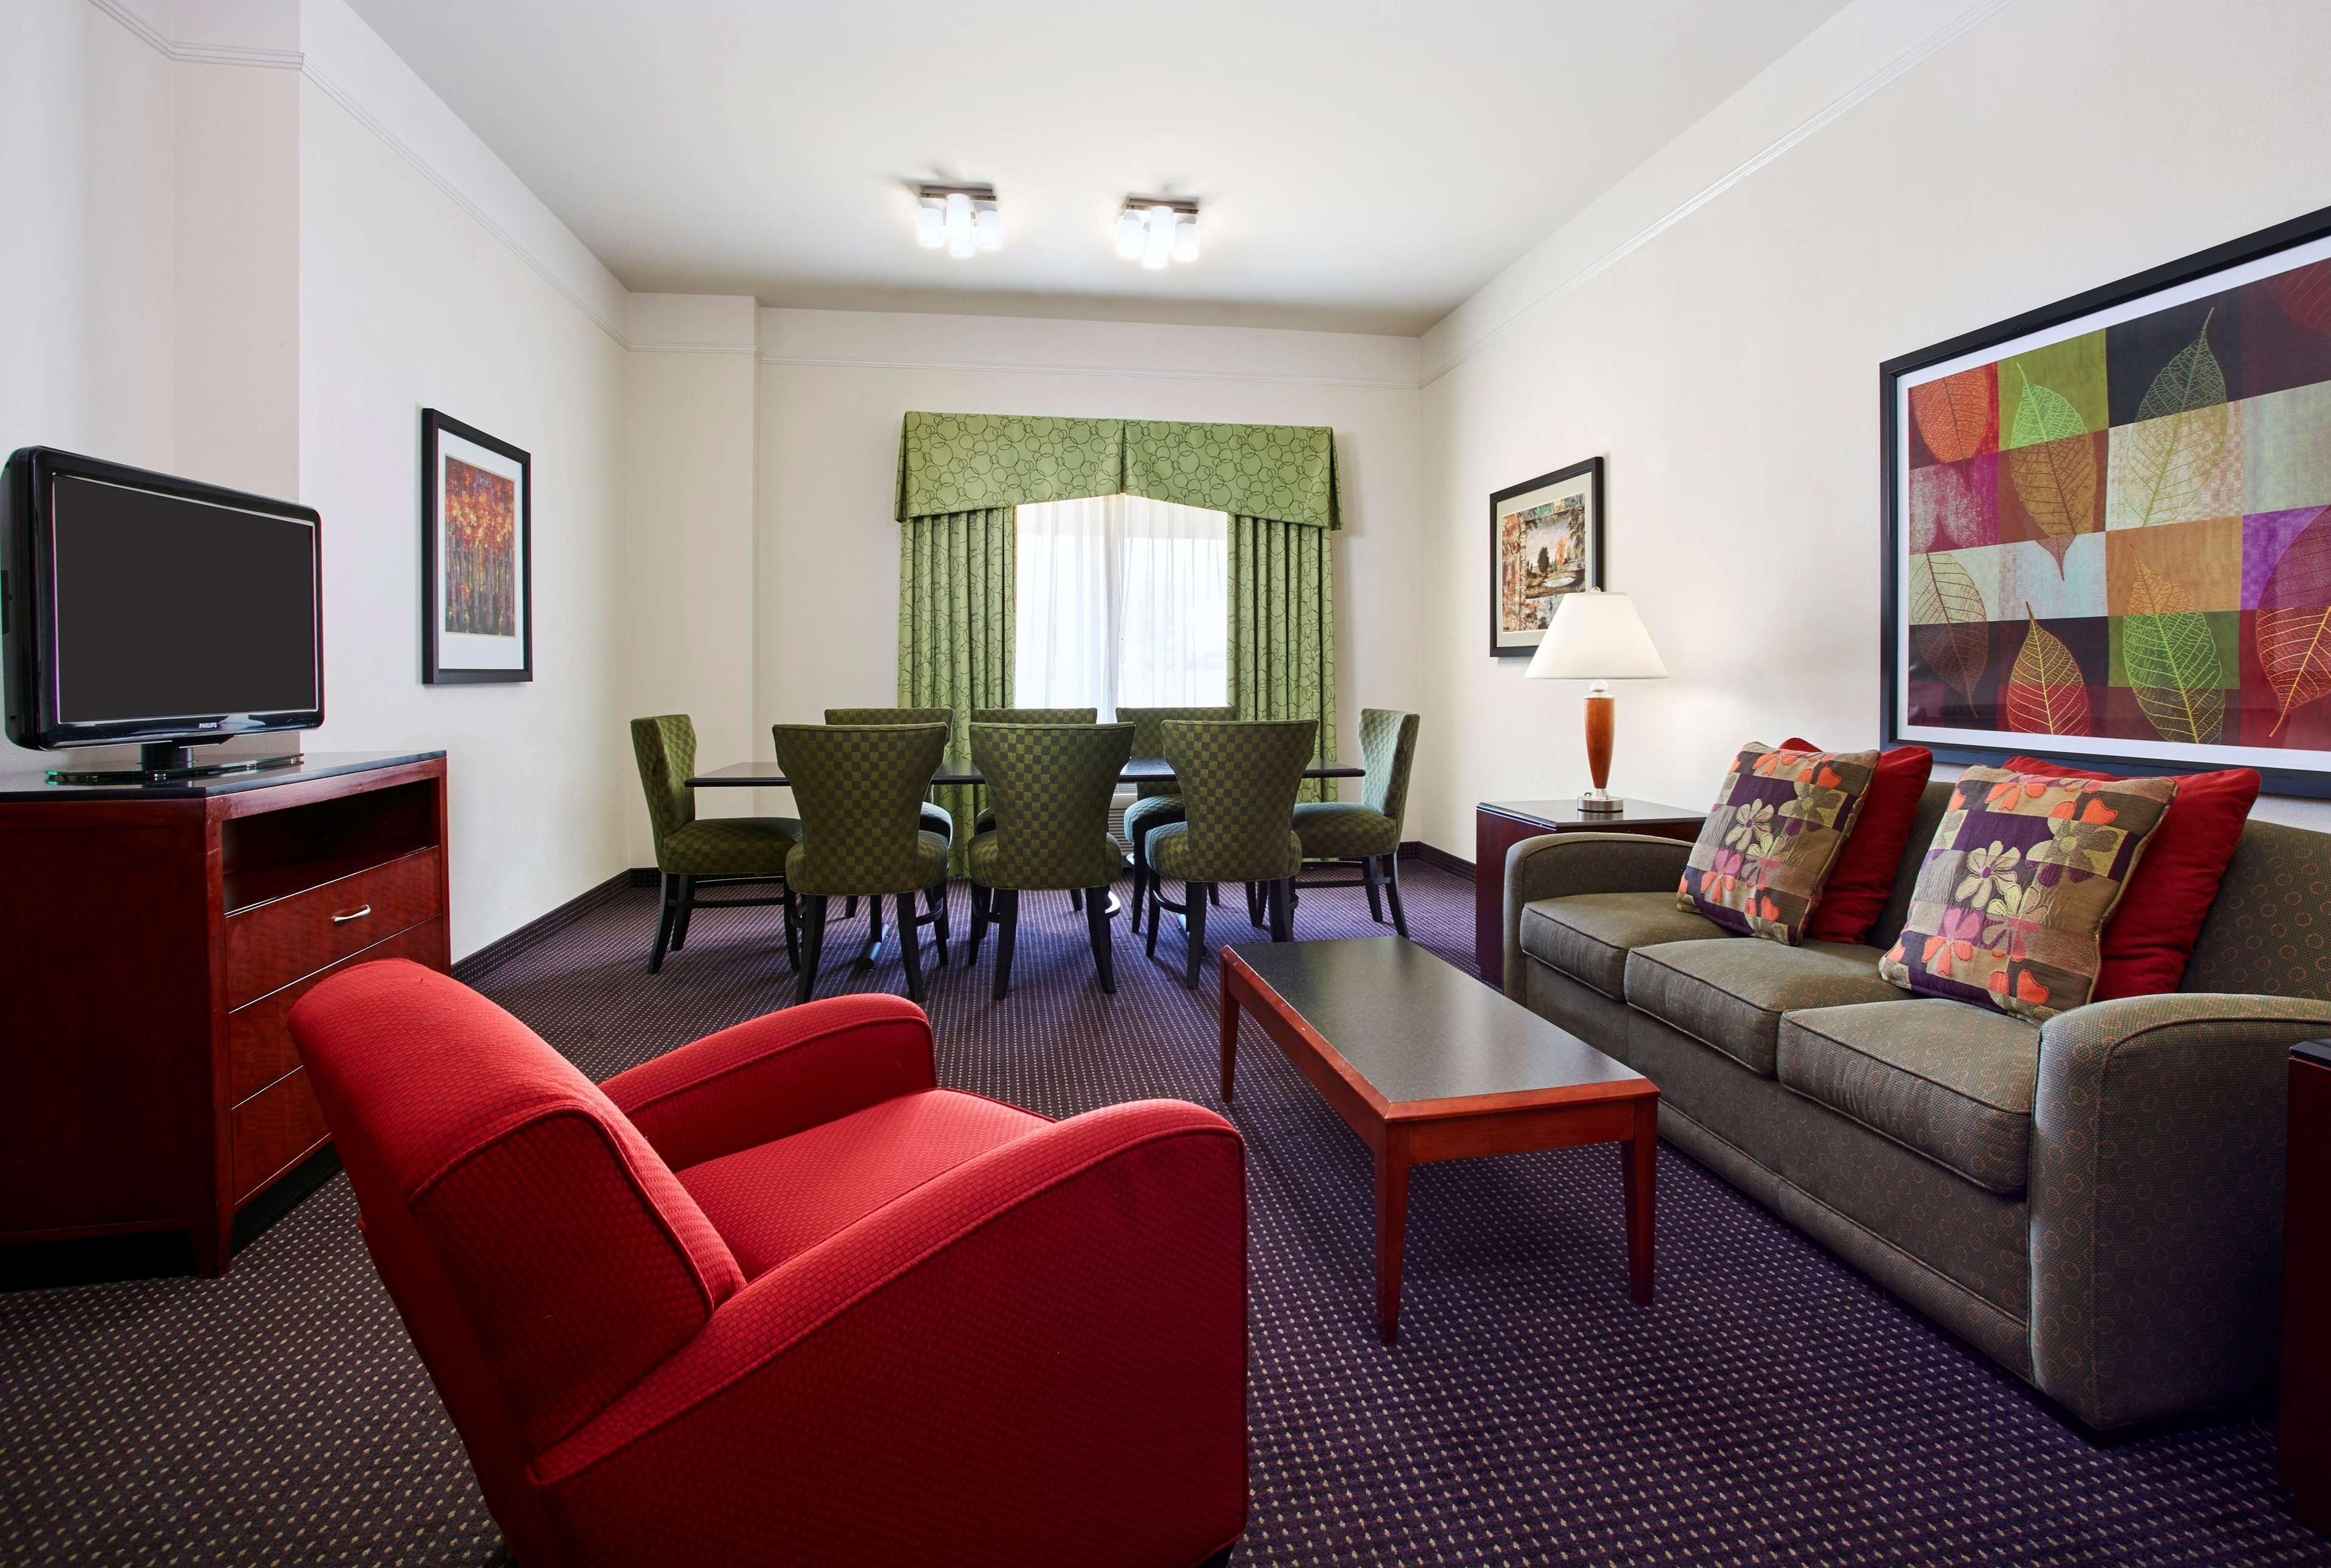 Hilton Garden Inn Rockville-Gaithersburg image 23